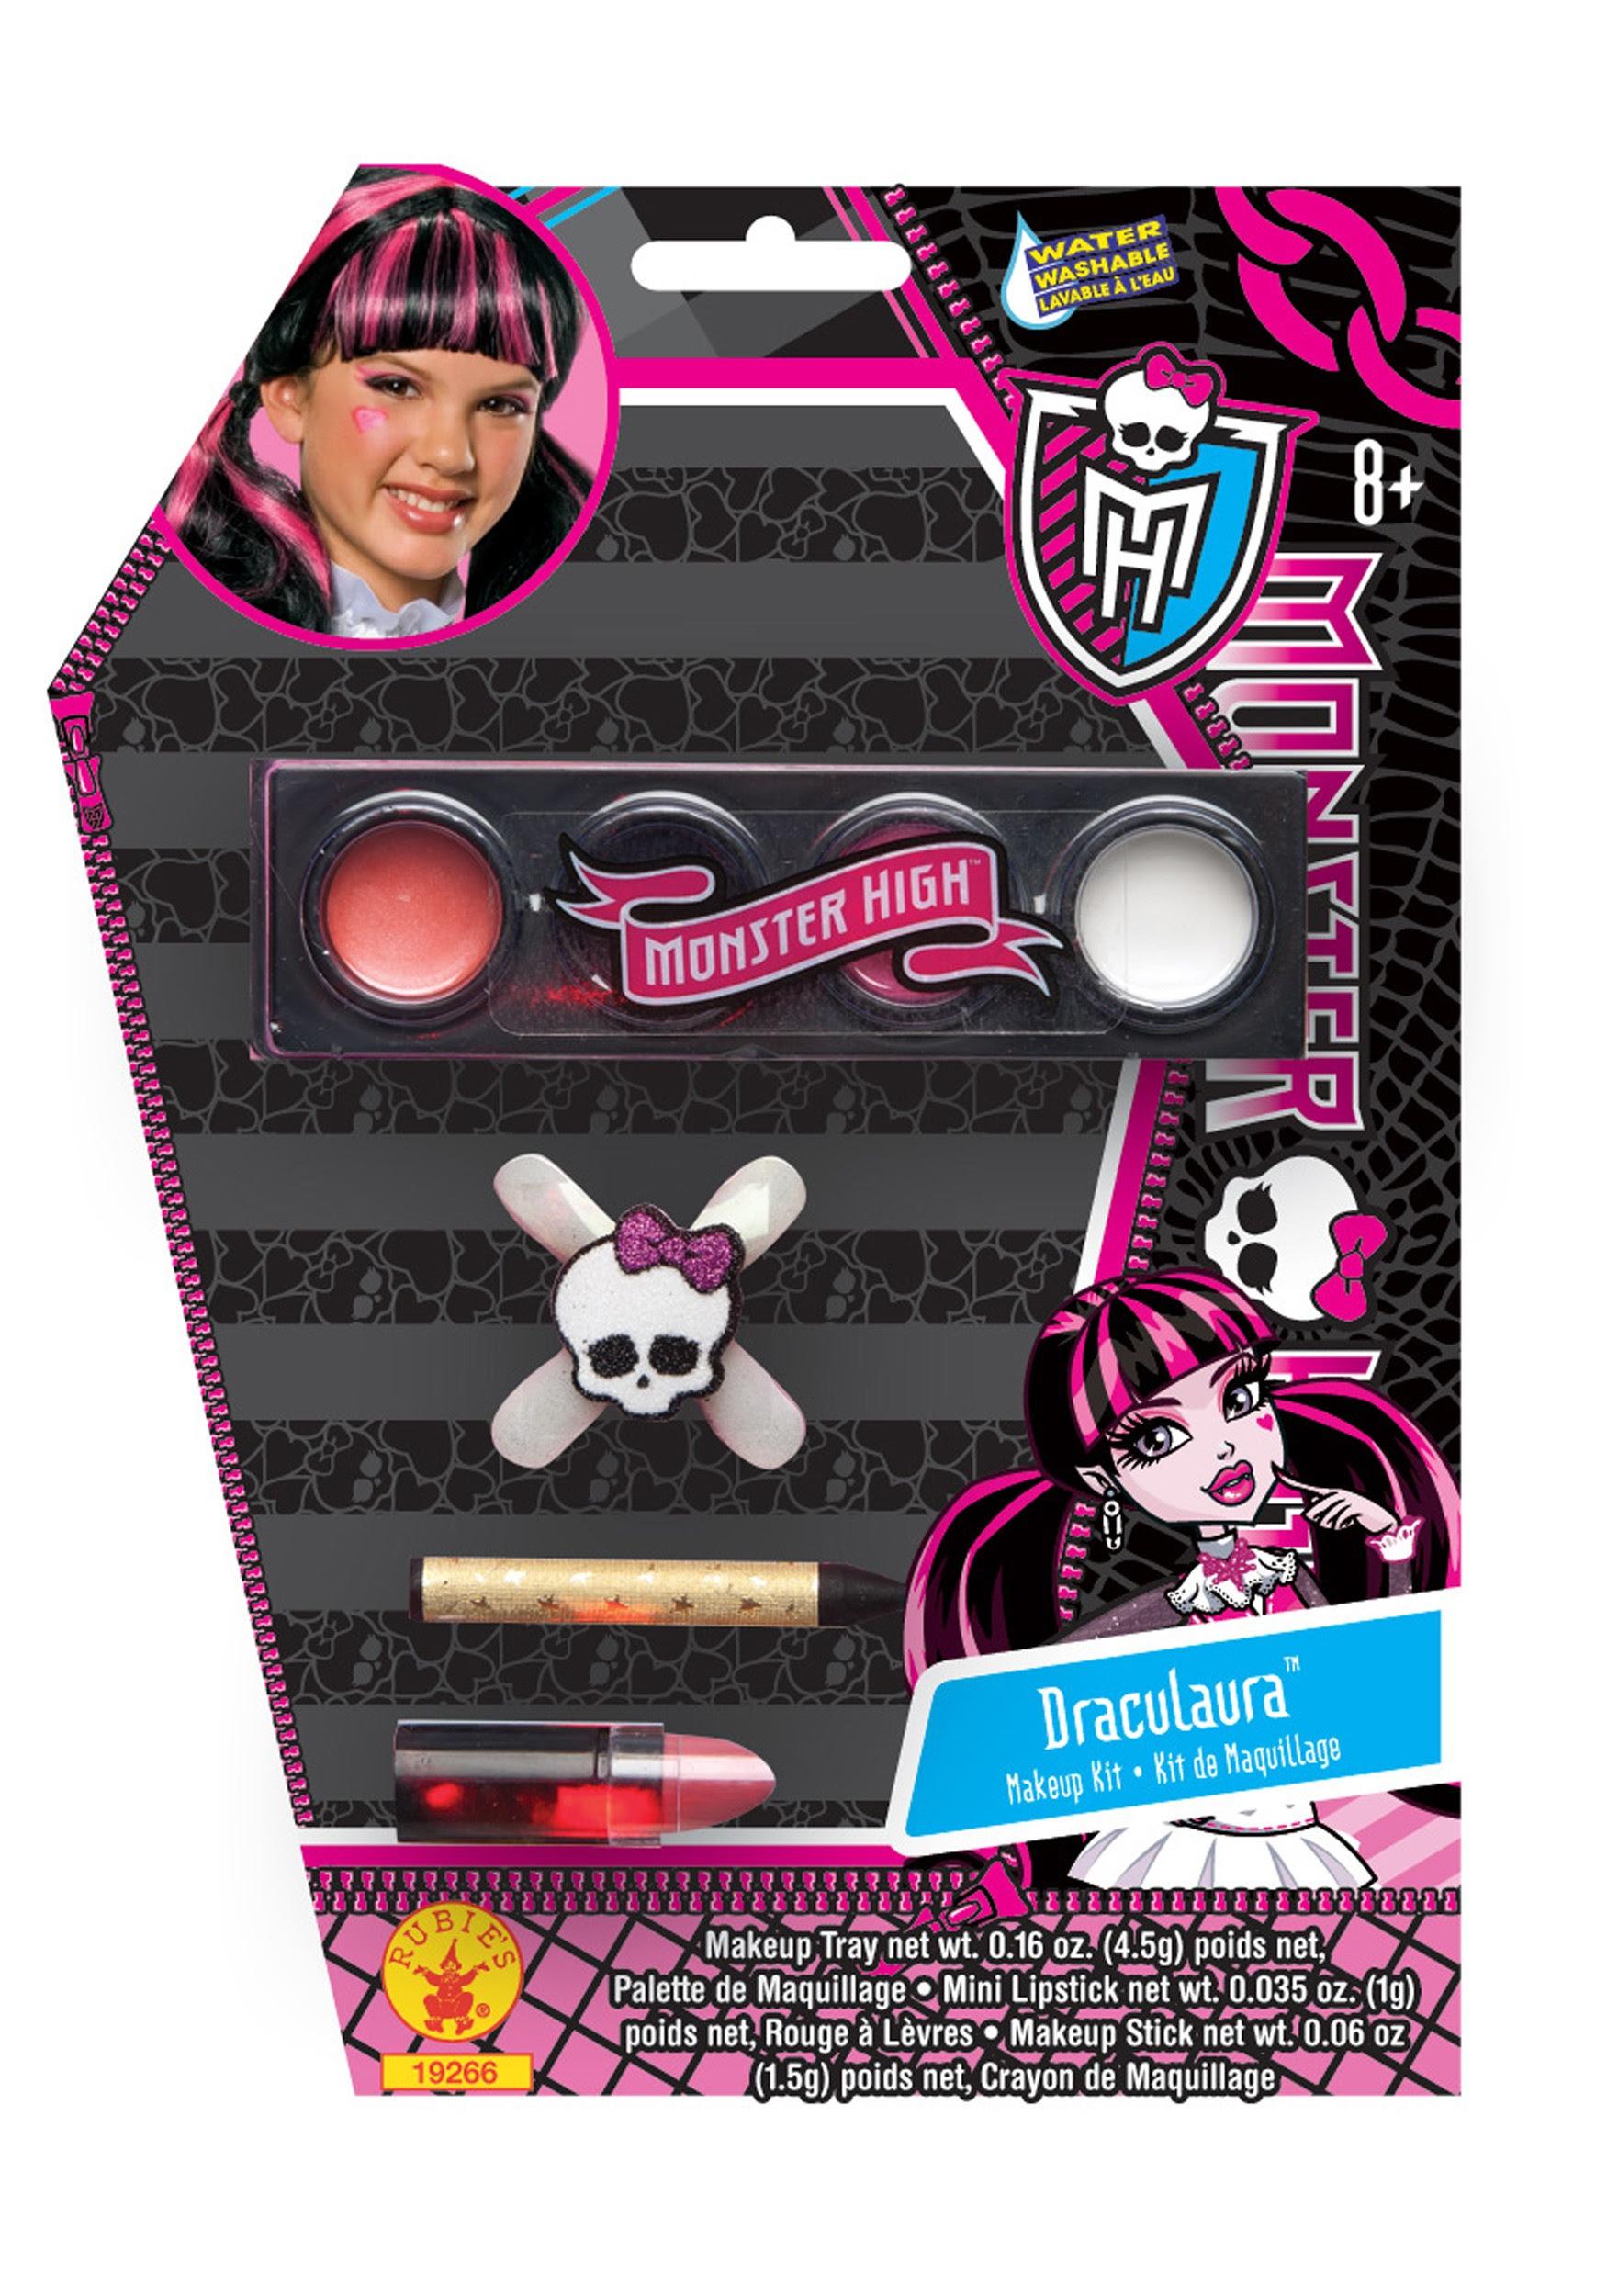 Halloween makeup kits for adults s kids